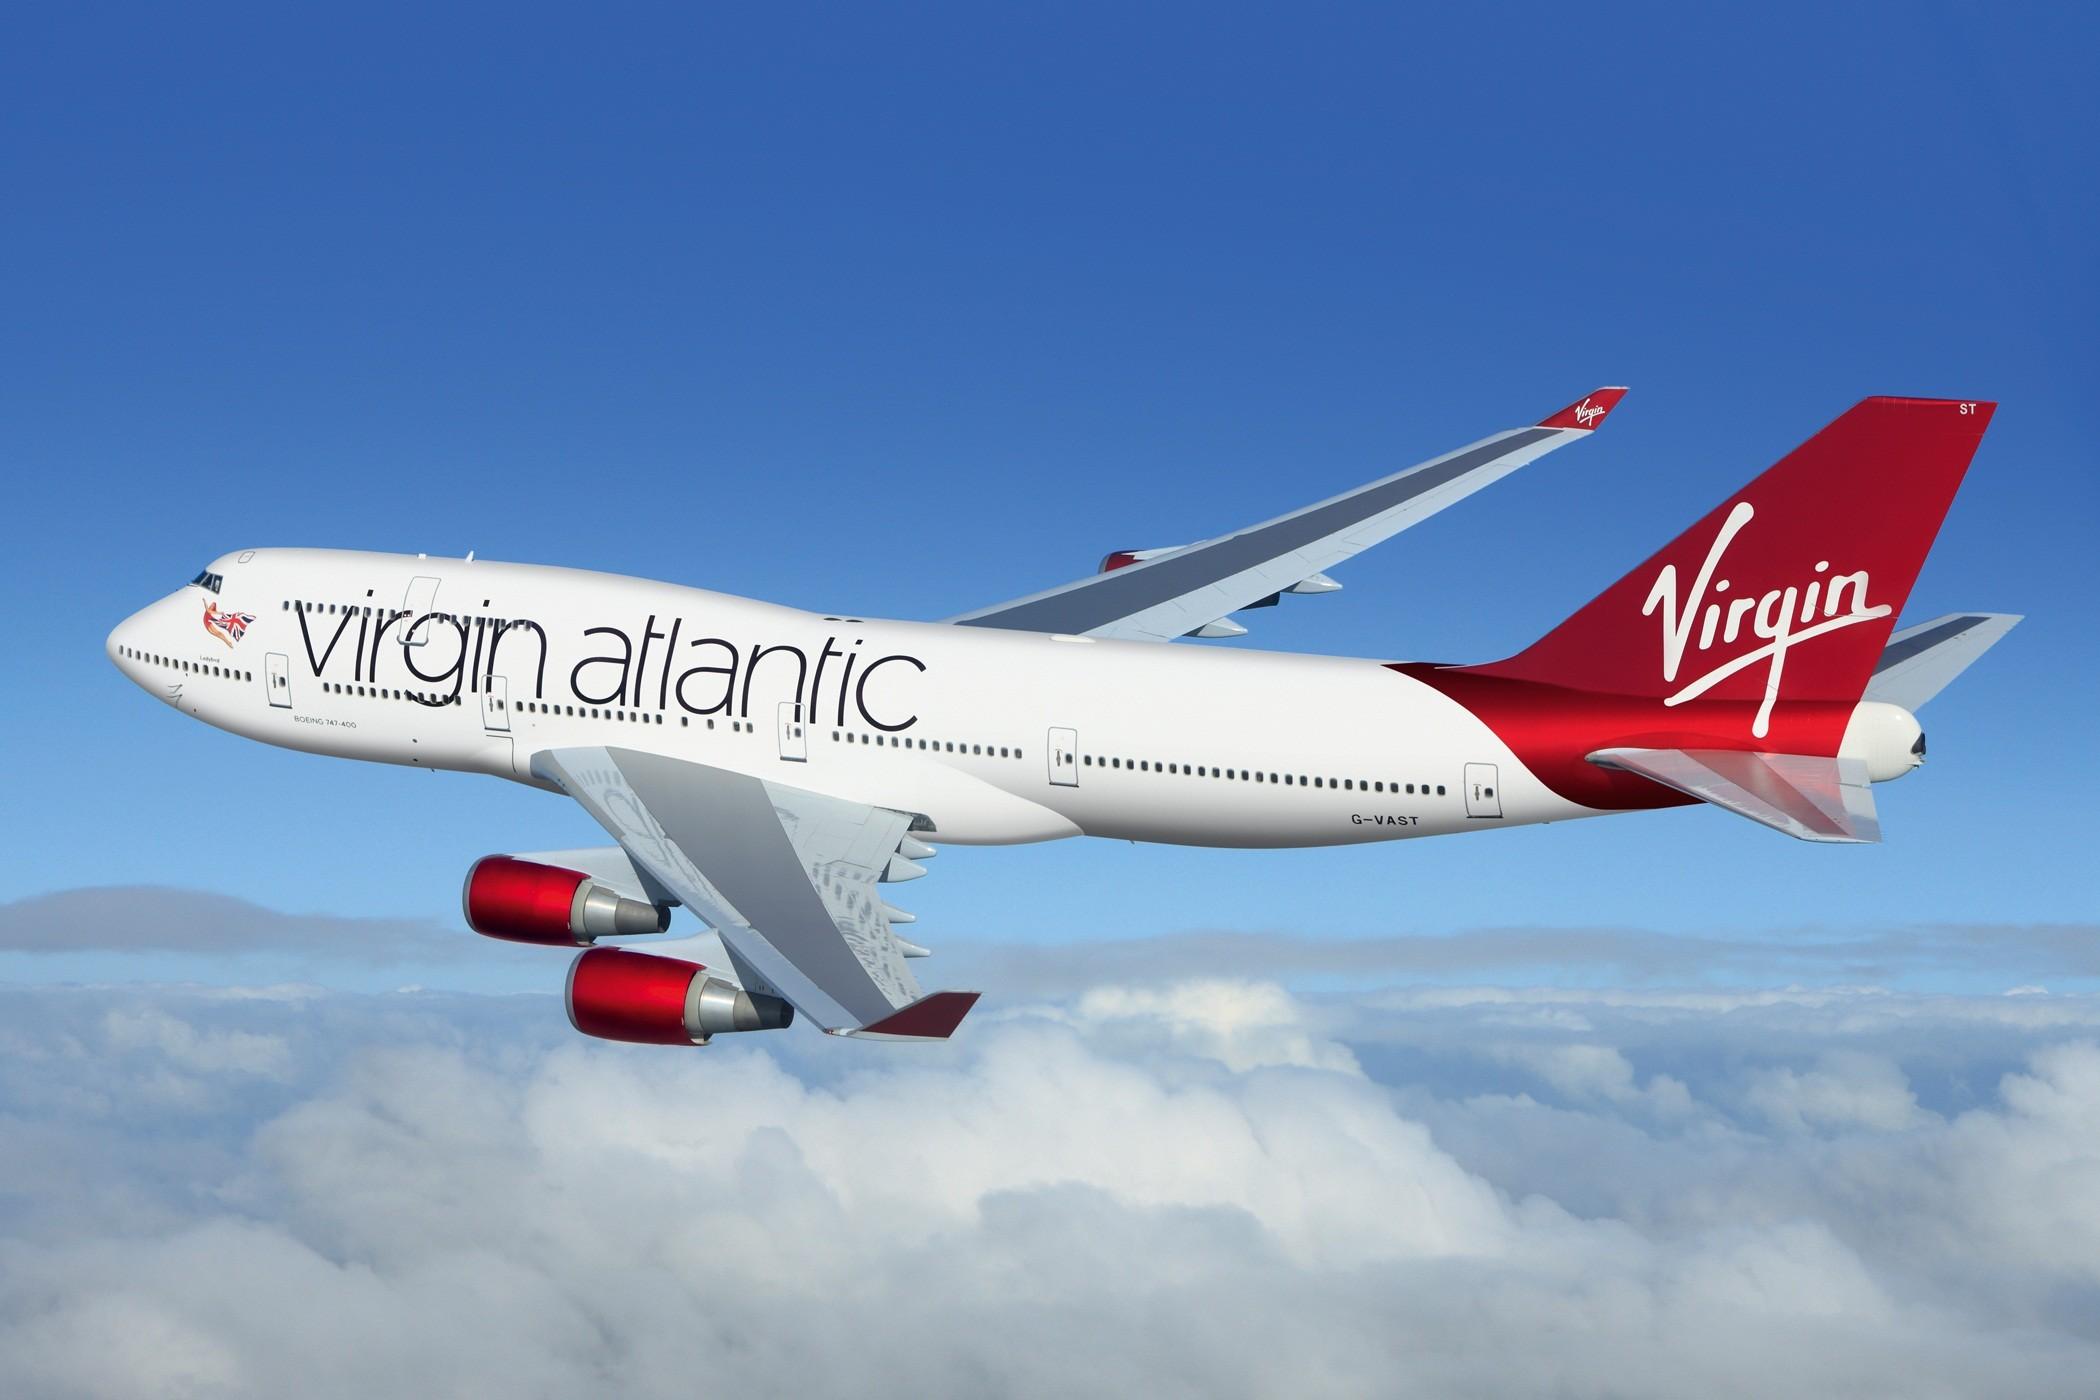 13-NEW Virgin Atlantic.jpg